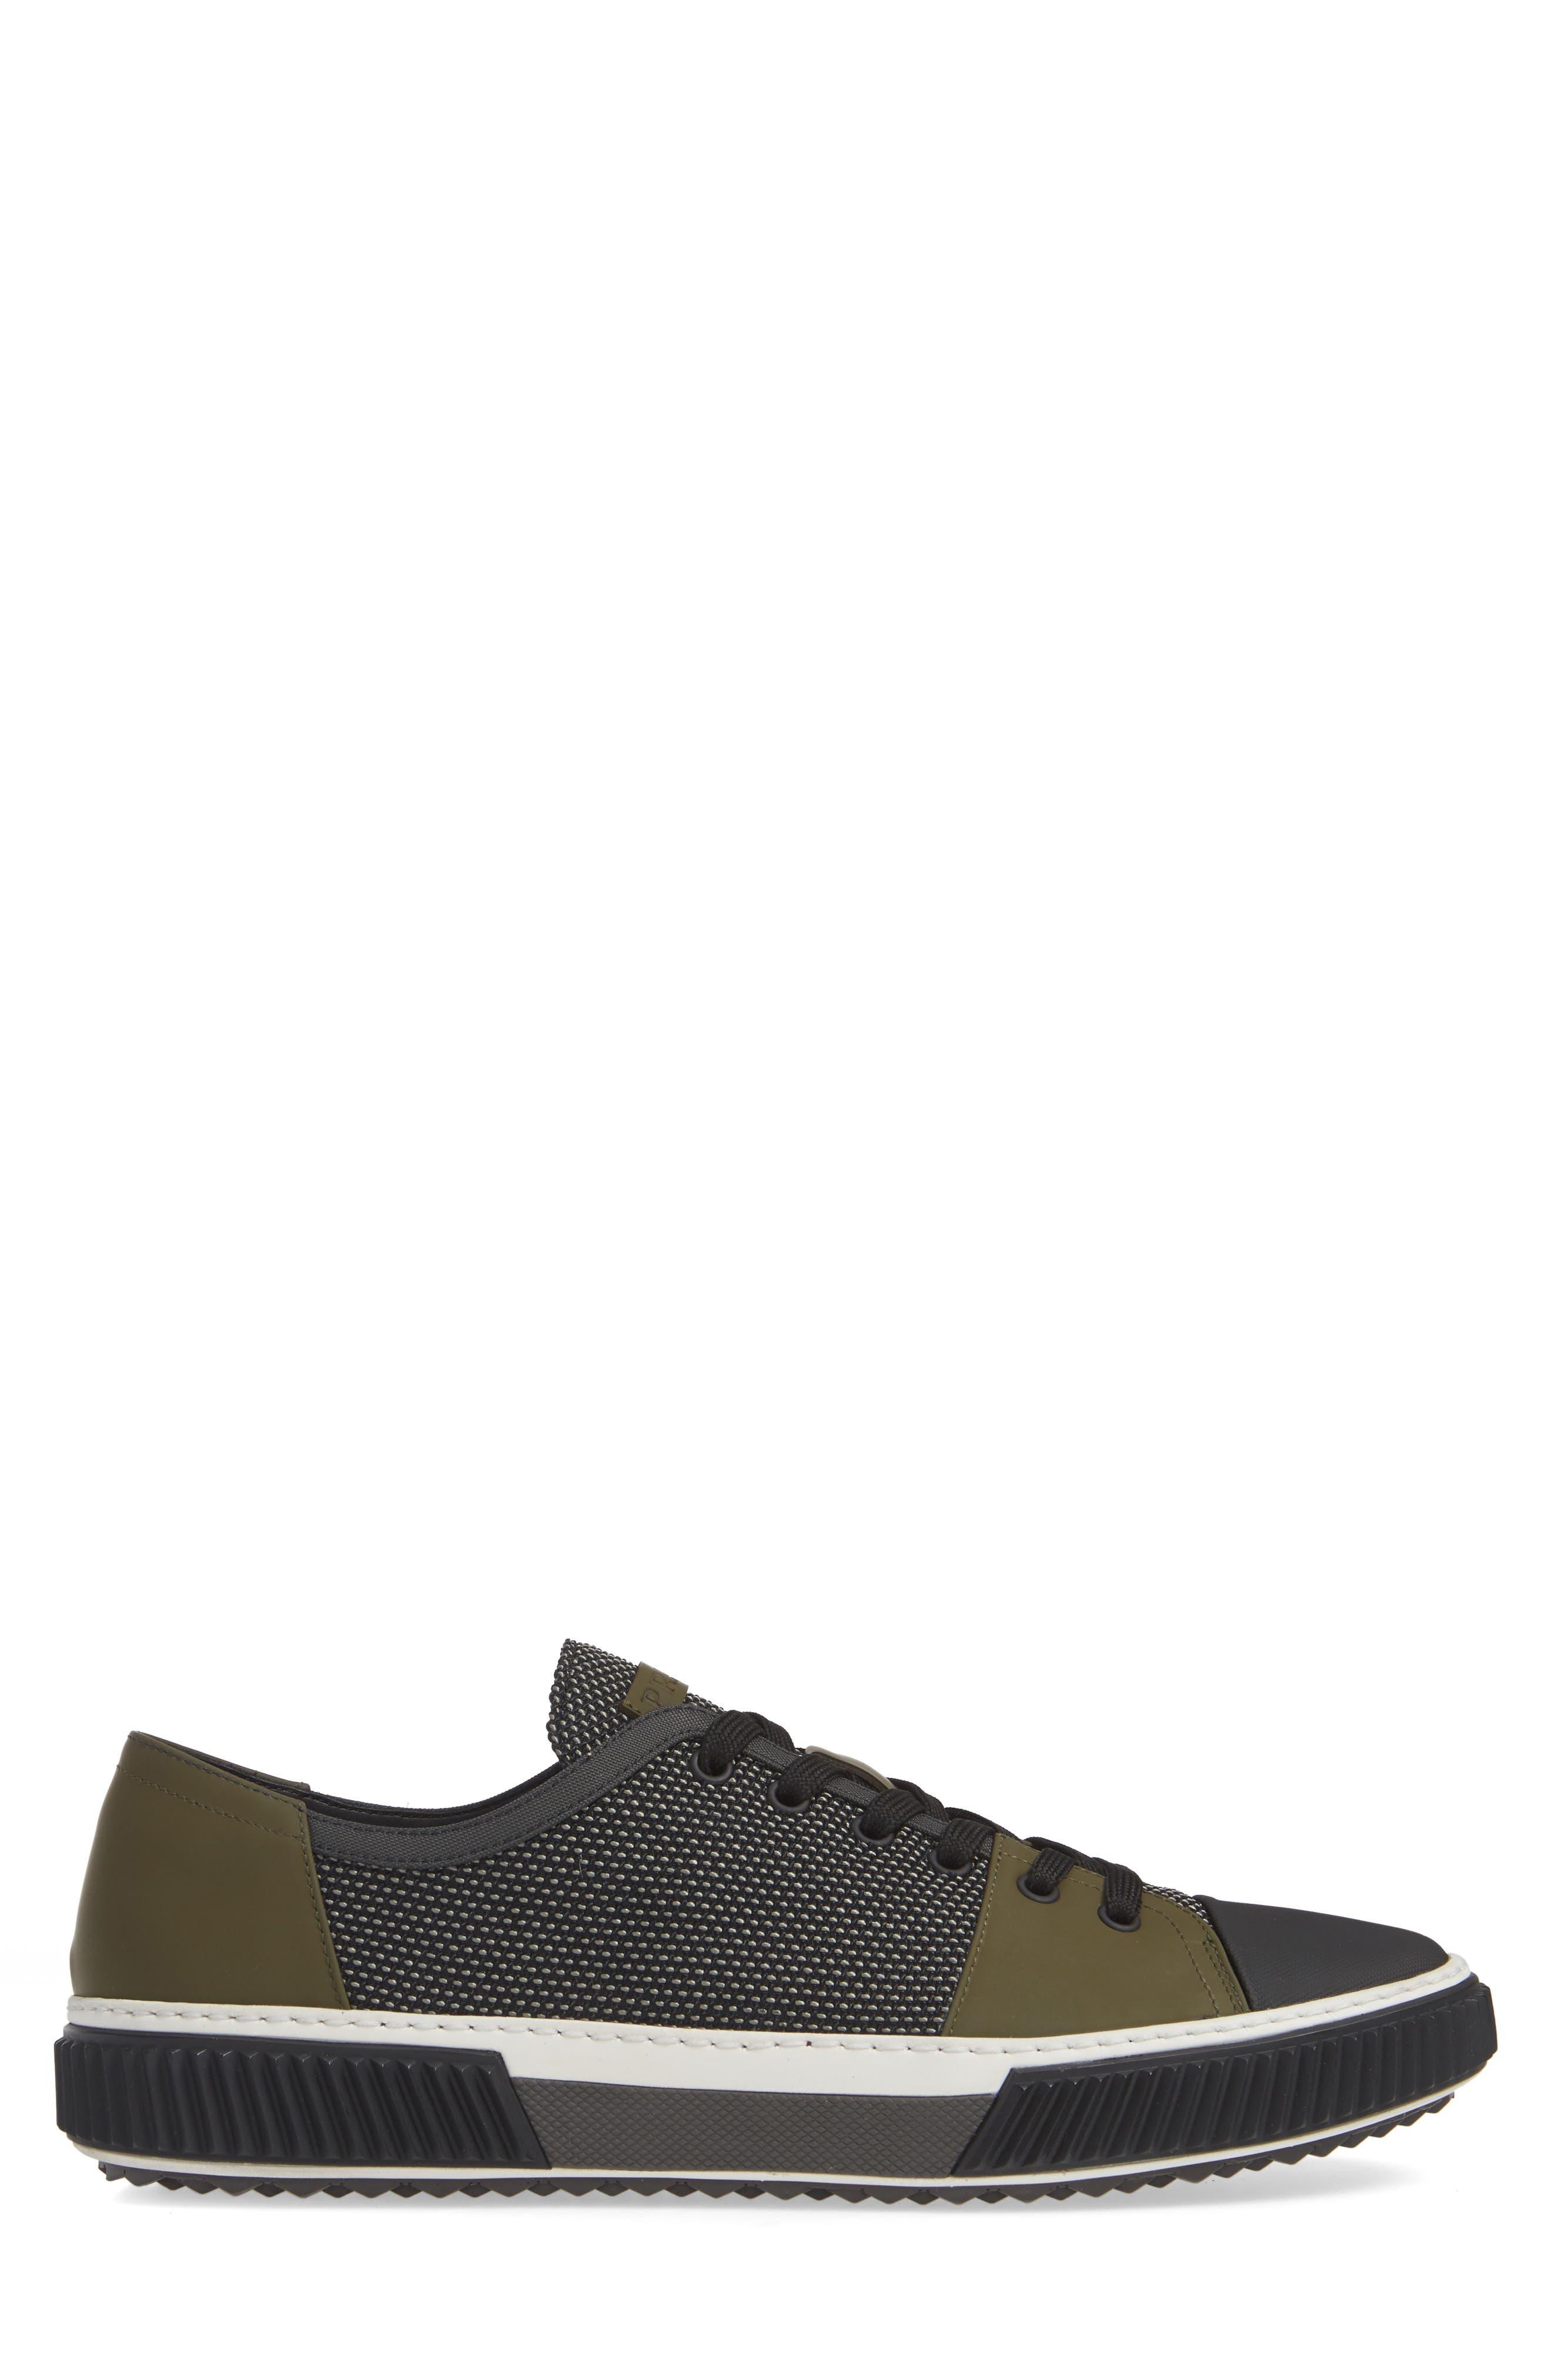 PRADA,                             Linea Rossa Sneaker,                             Alternate thumbnail 3, color,                             GREY/ BLACK